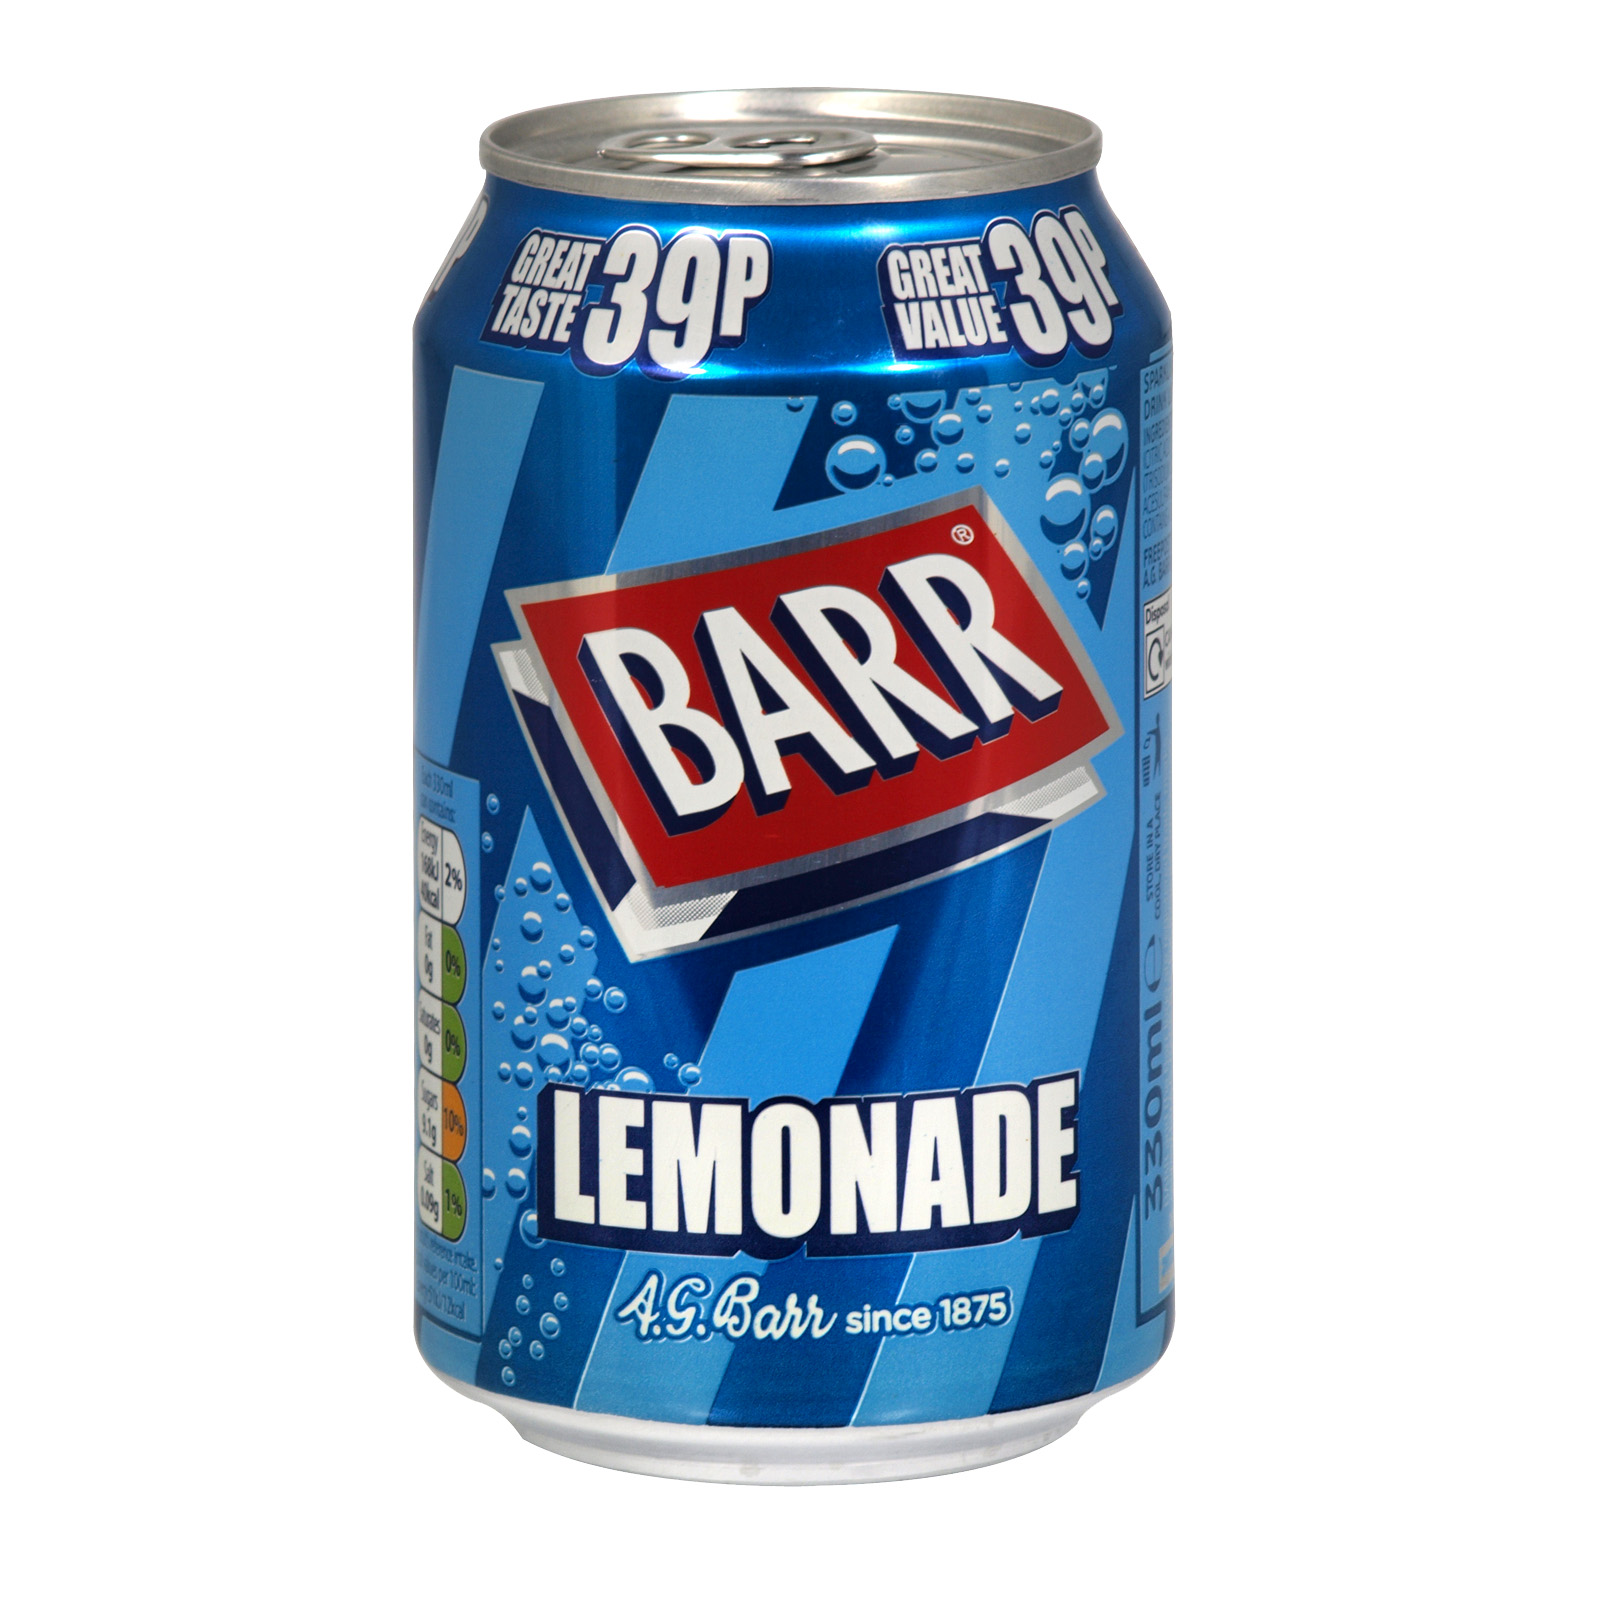 BARR 330ML CANS LEMONADE PM 39P